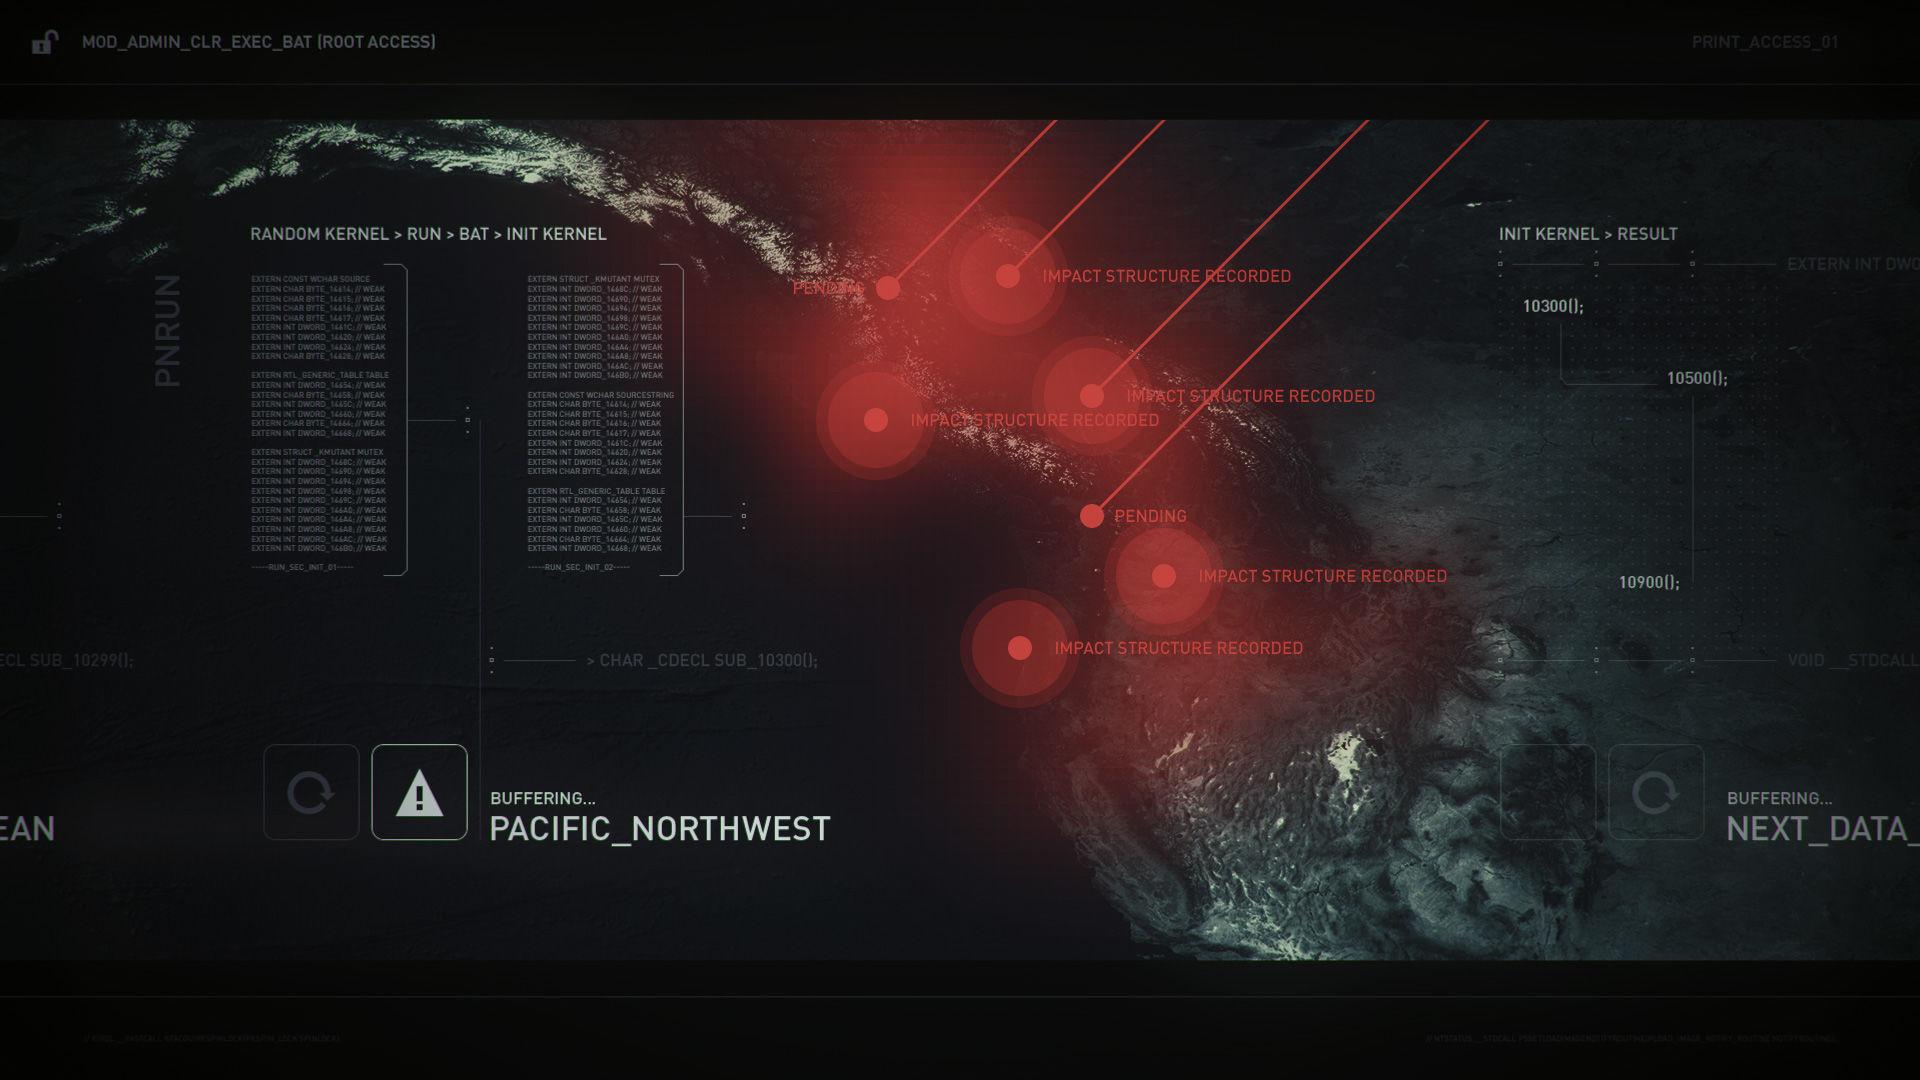 "<a href=""/asteroid-final-impact-screen-design"">Asteroid: Final Impact Screen Design</a>"